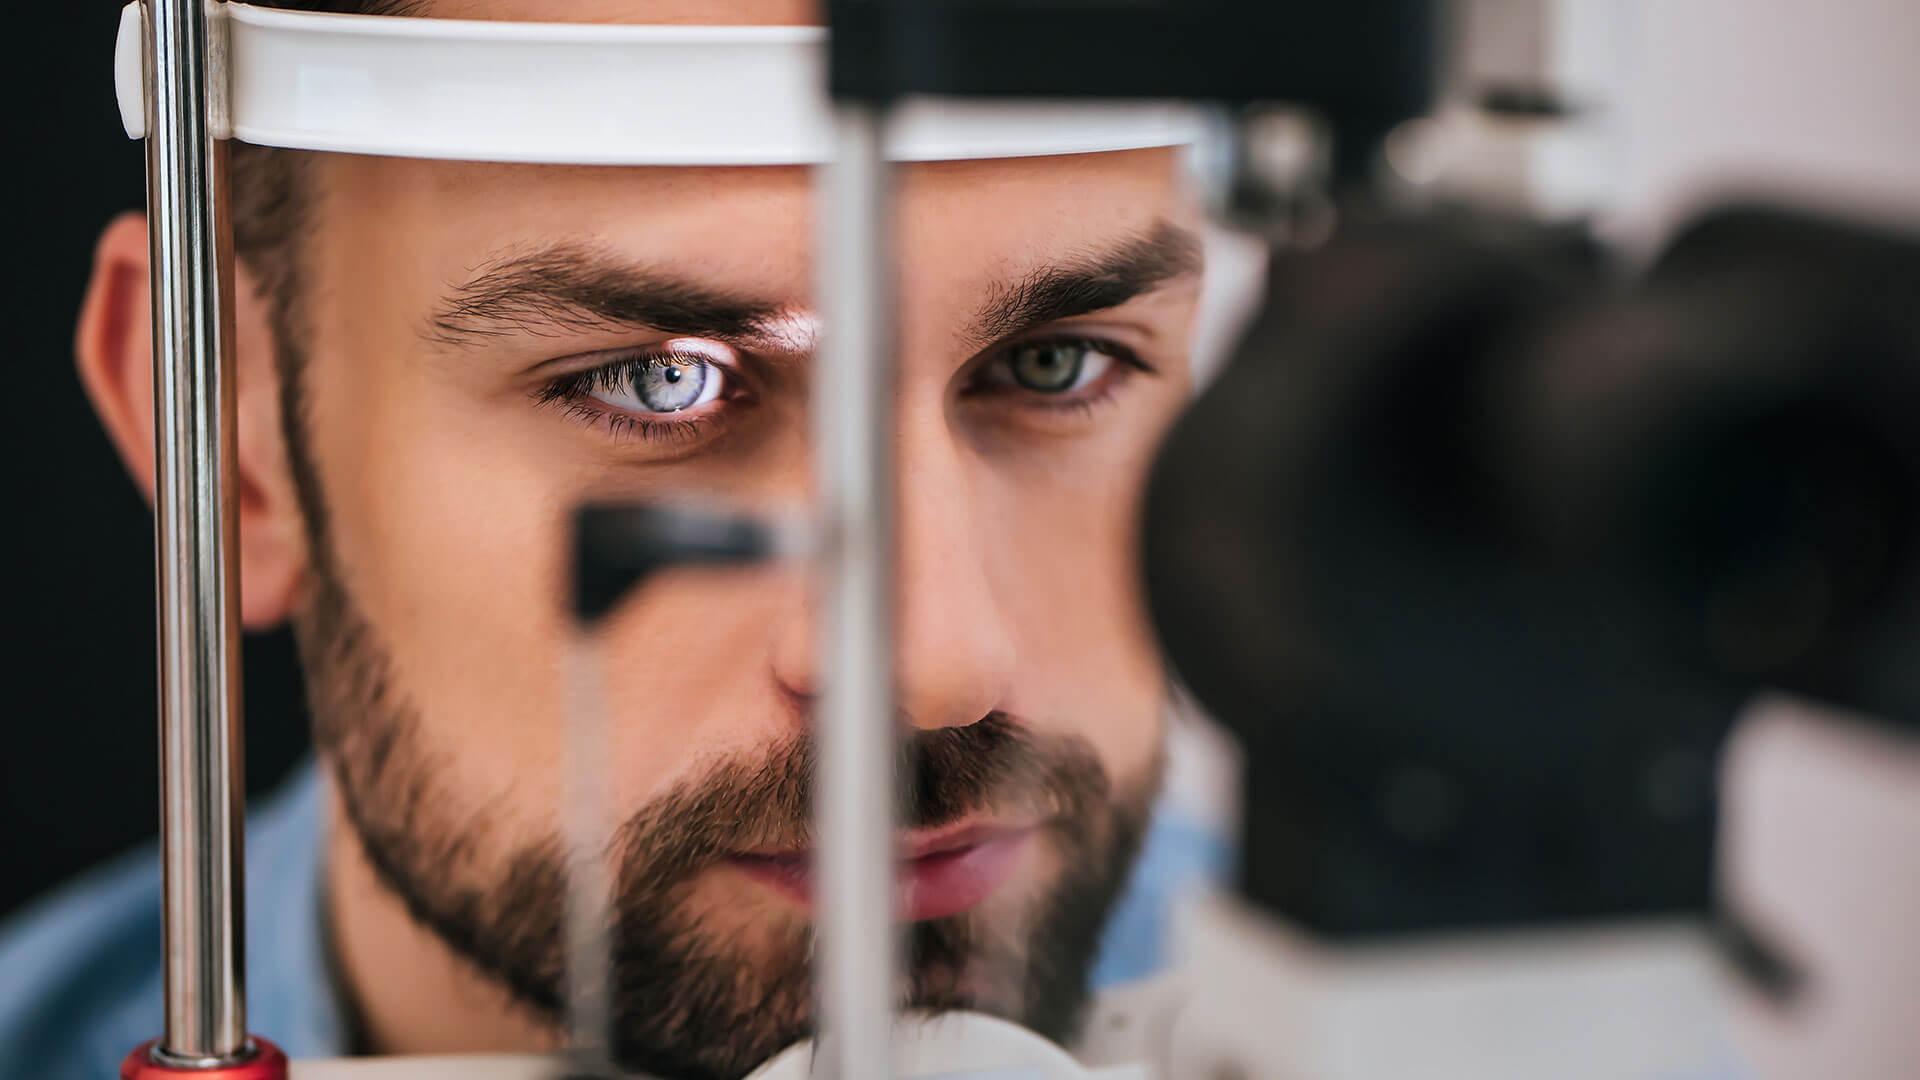 Bei akuten Beschwerden den Augenarzt kontaktieren